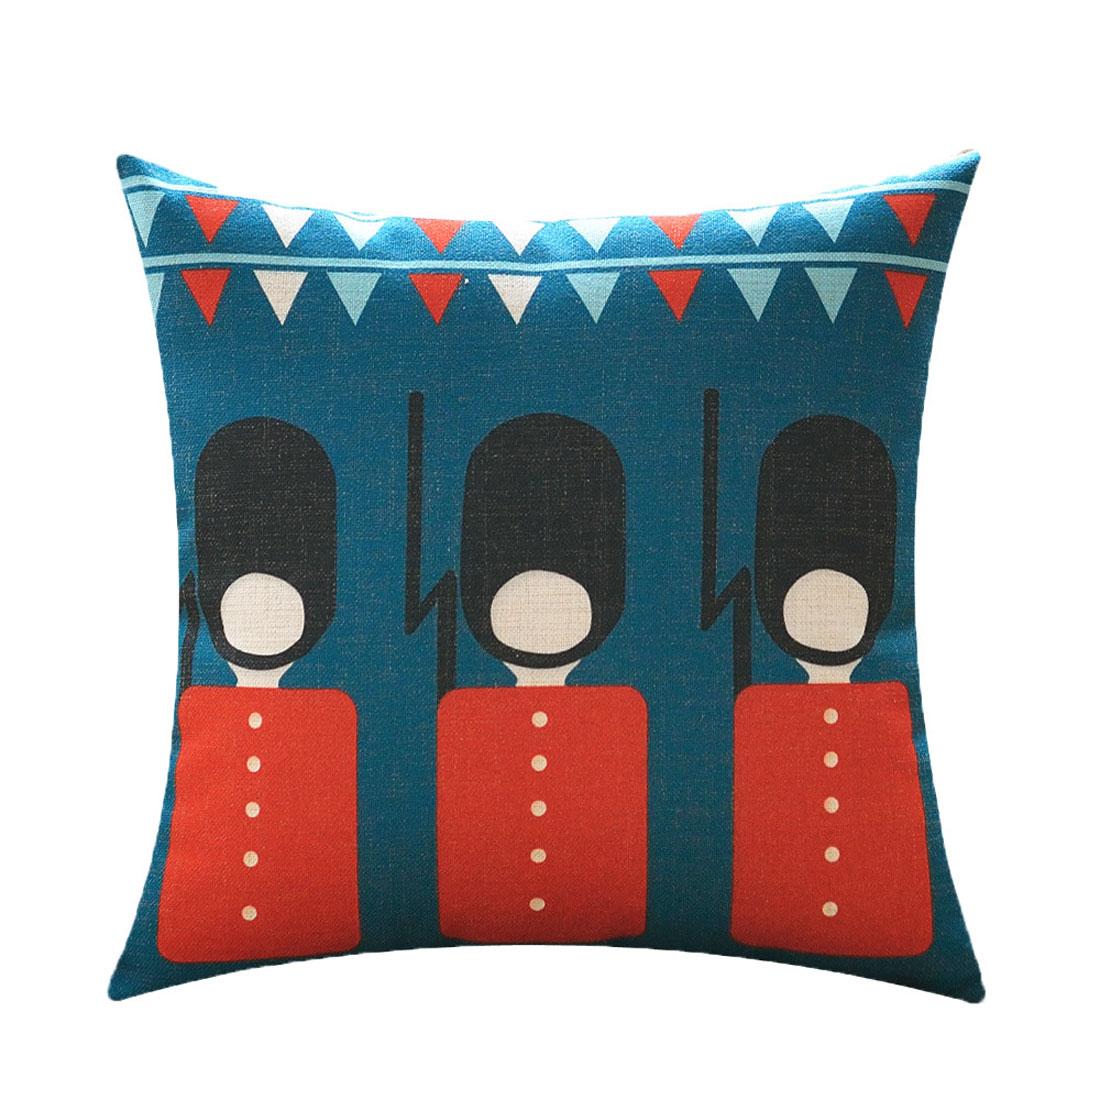 Sofa Cotton Linen English Telephone Booth Pattern Waist Throw Cushion Cover Pillow Case